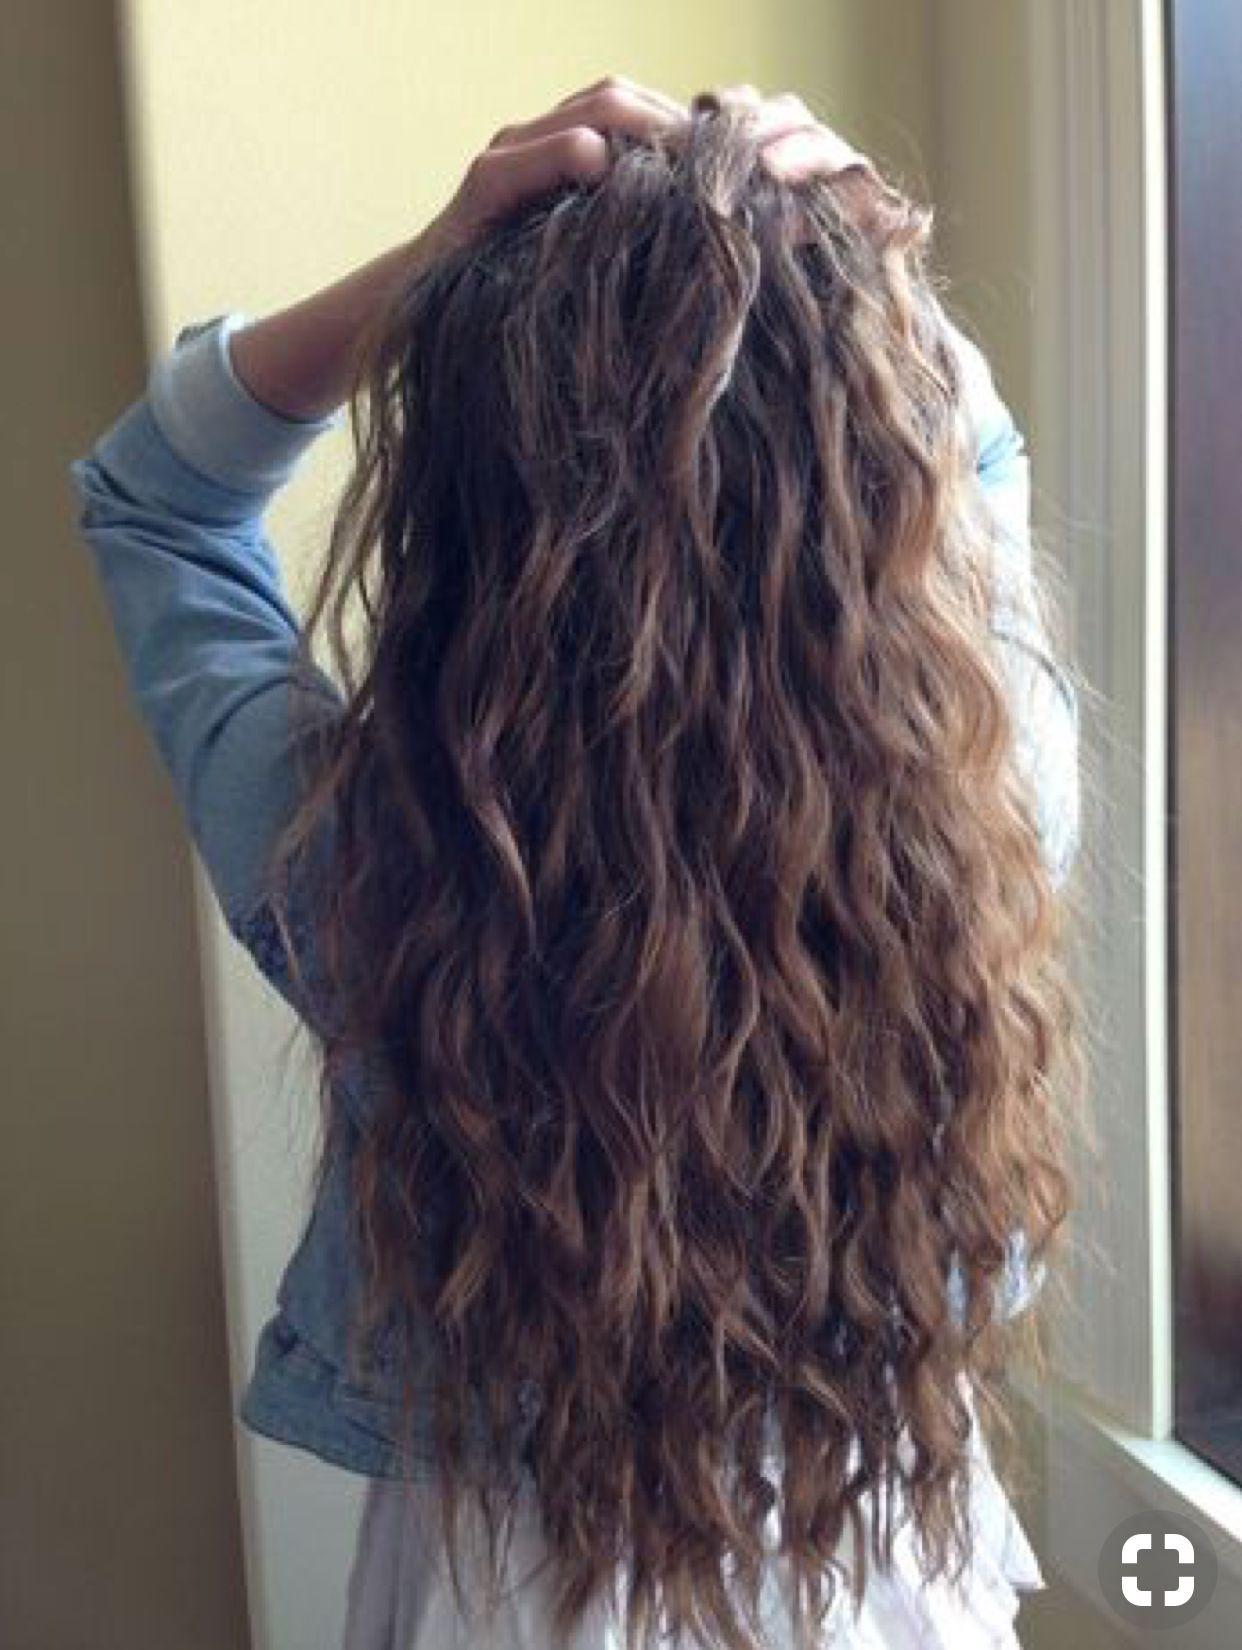 Pin By Bob Grandpre On Hair Brown Wavy Hair Thick Hair Styles Hair Styles